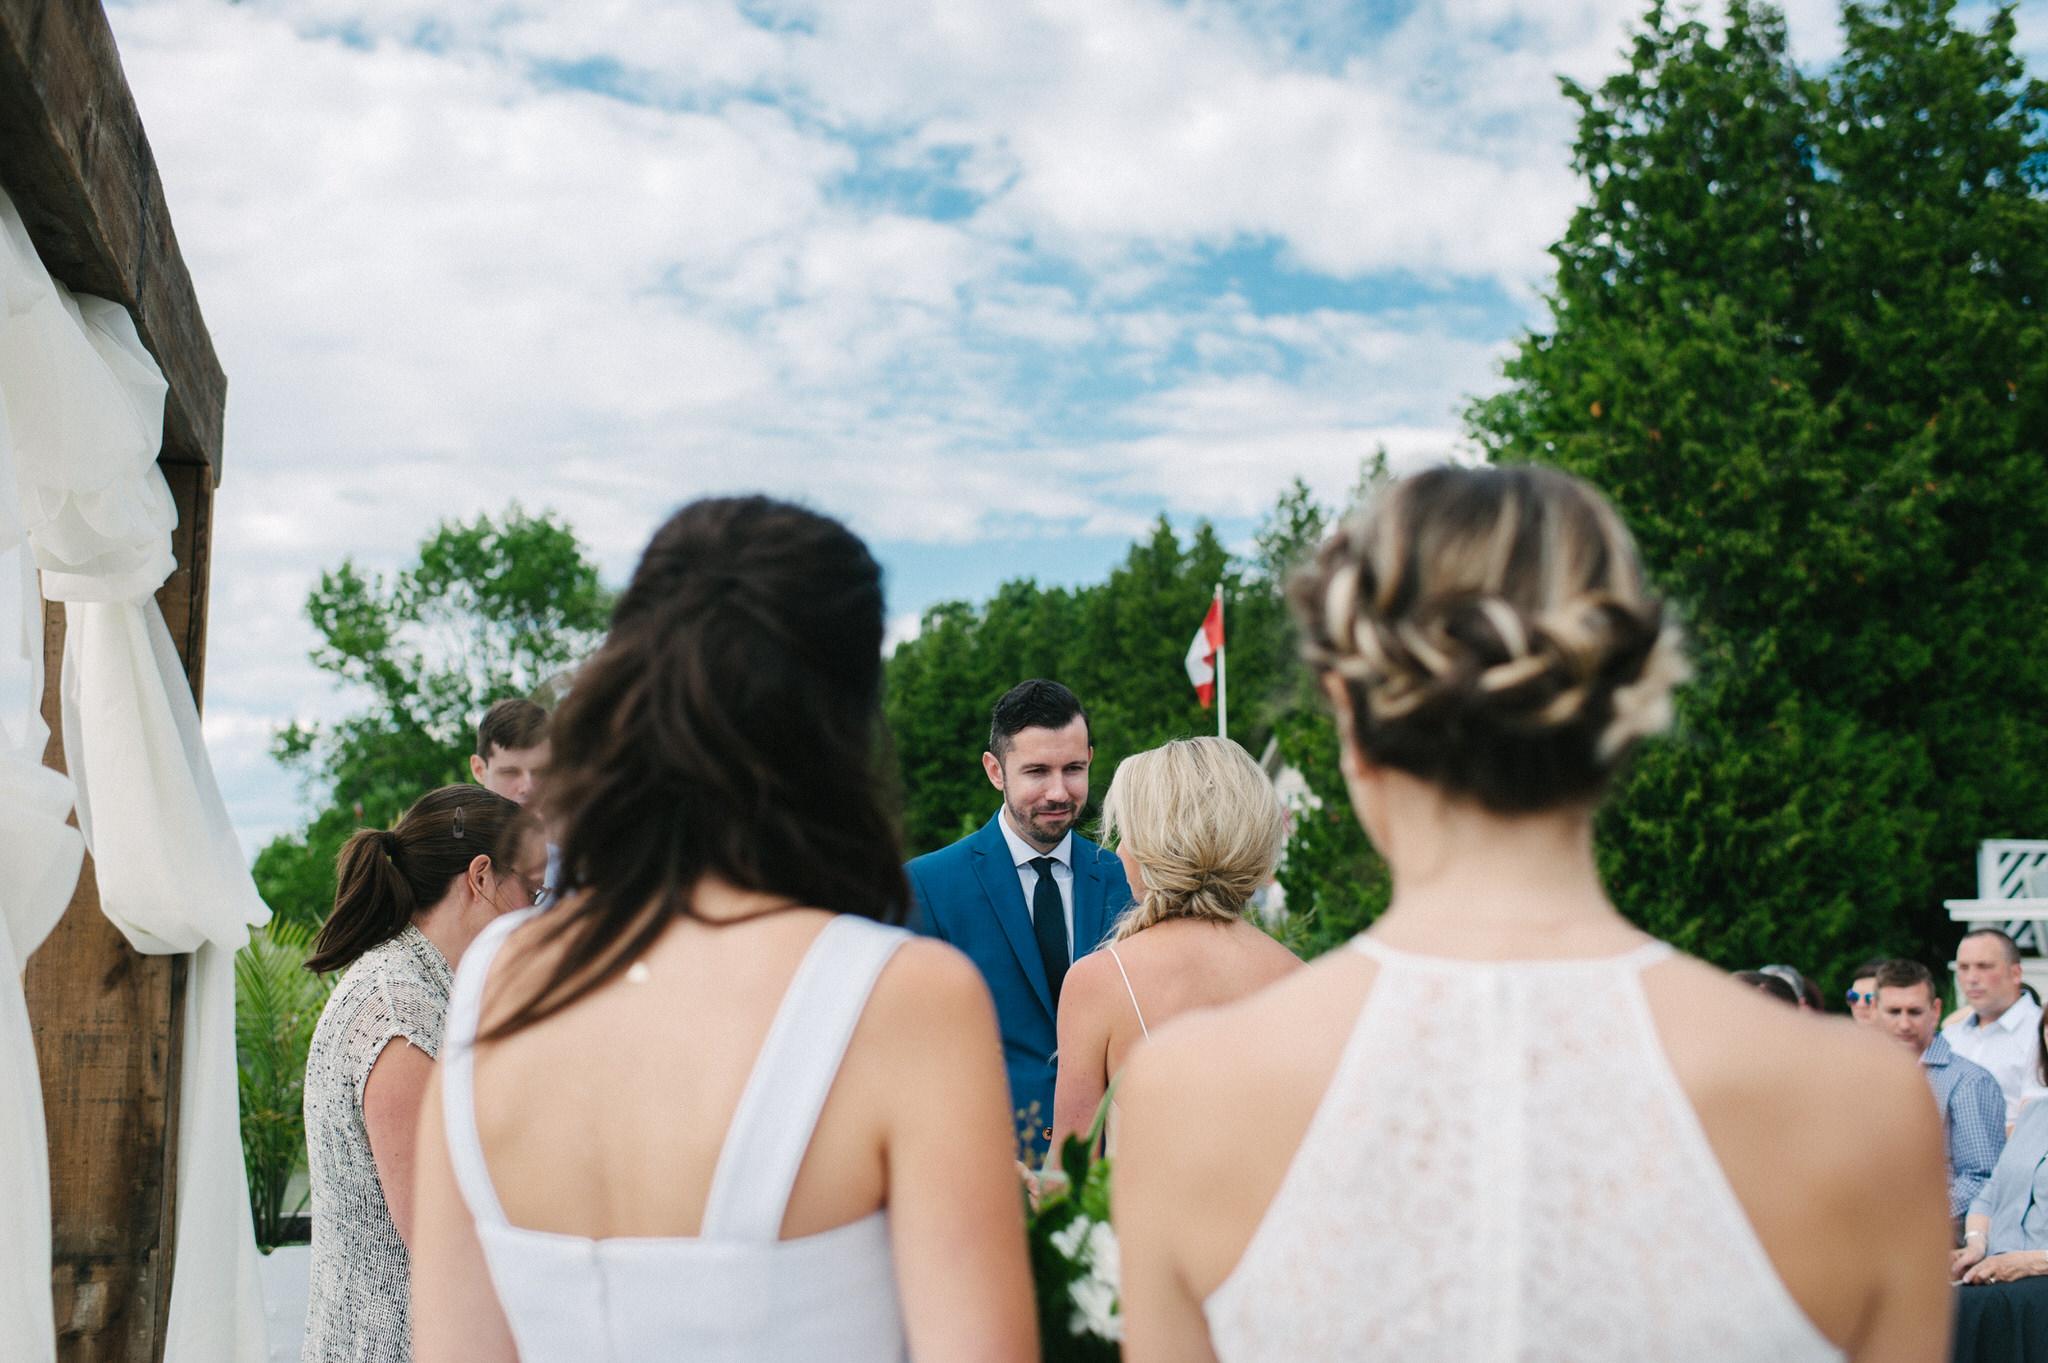 toronto wedding photography scarlet oneill088.JPG